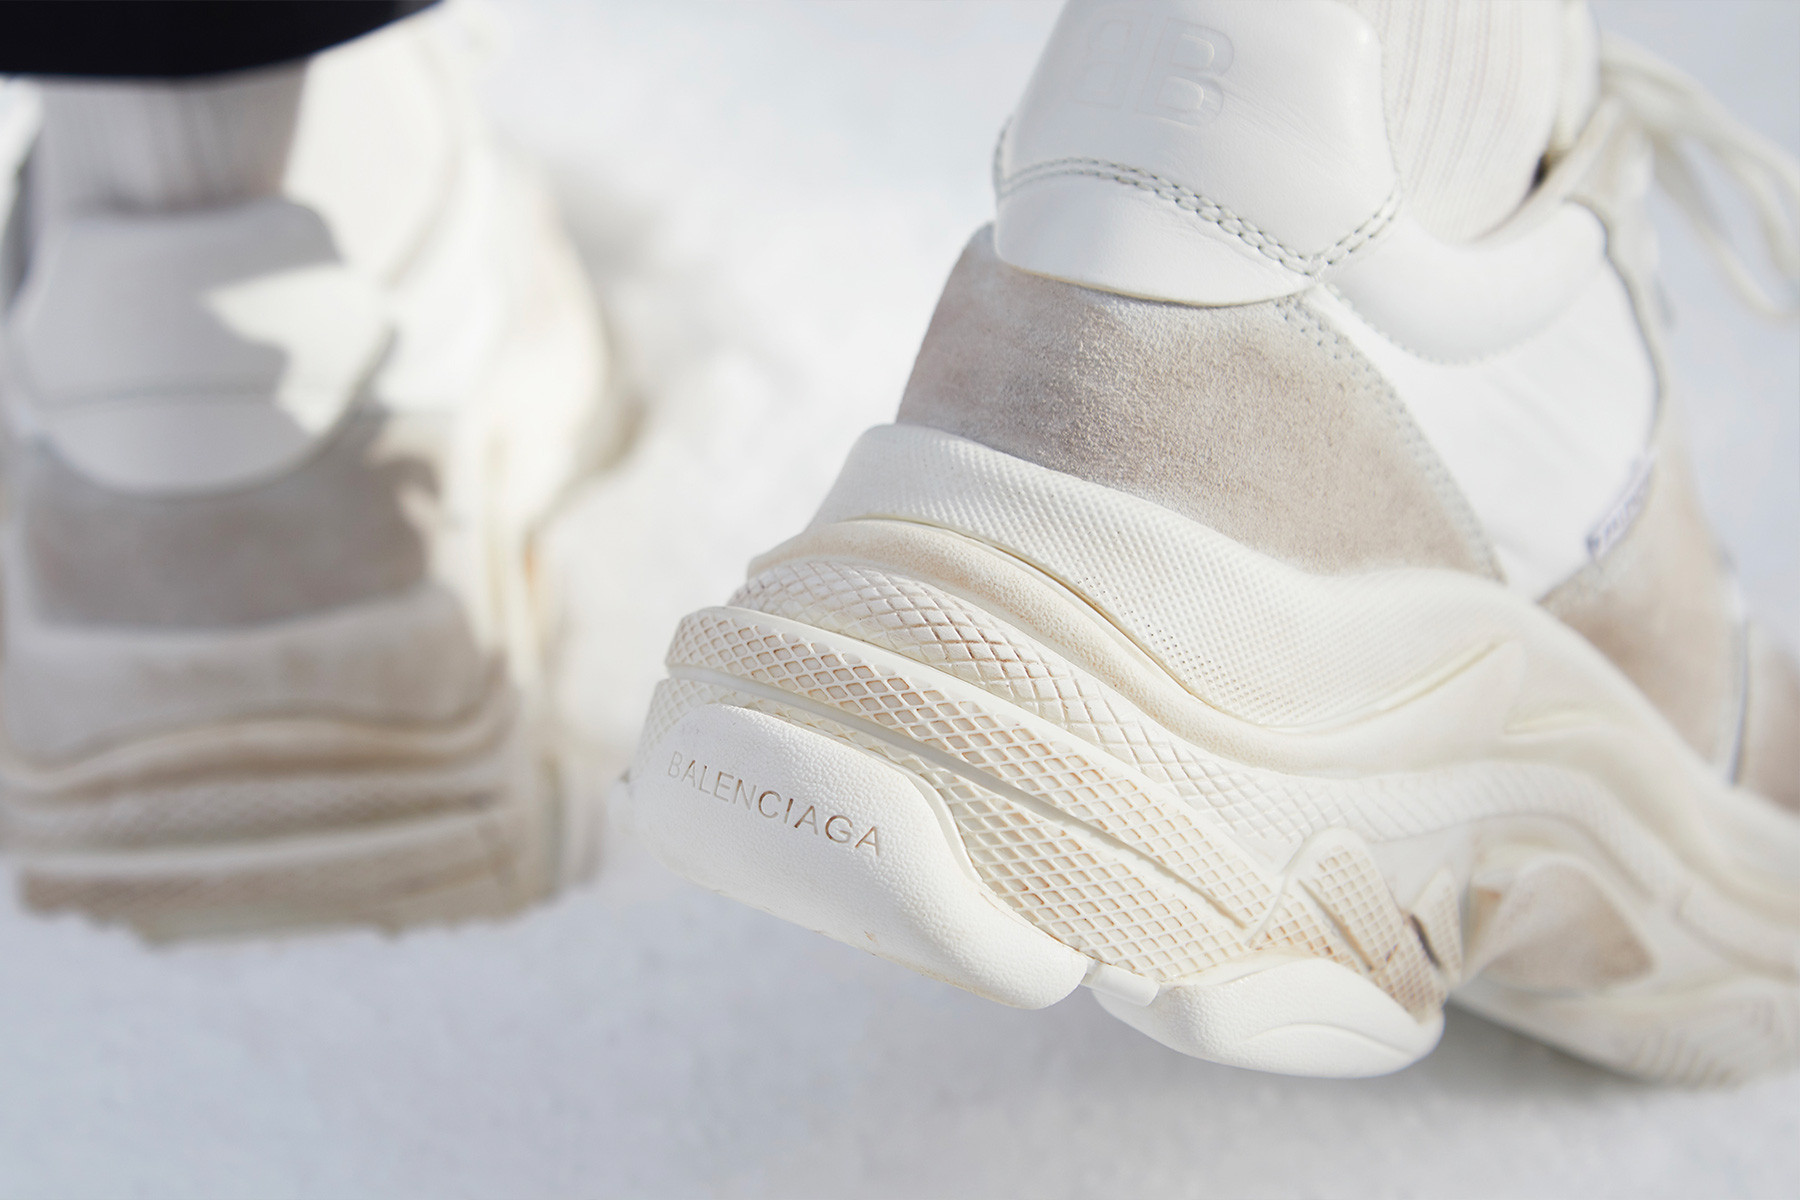 Balenciaga Sneakers White Triple S Plain Low Top Lace Up